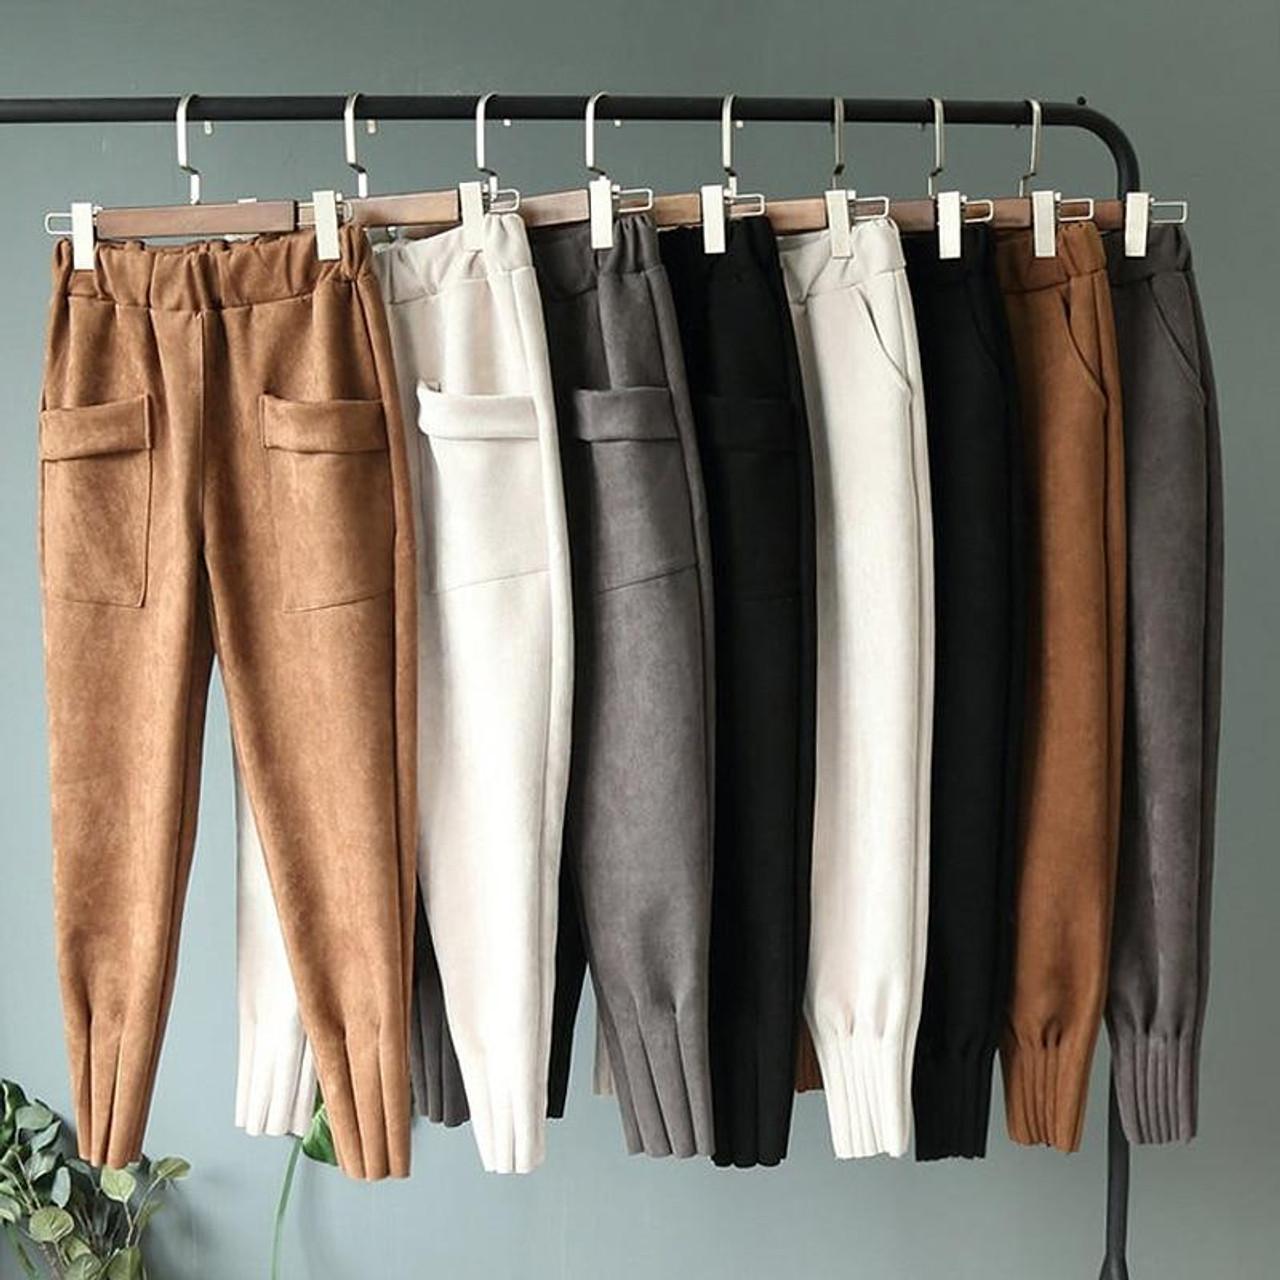 2019 Streetwear Women Pants Elastic High Waist Pockets Suede Harem Pants Casual Autumn Plus Size Trousers Women Pantalones Mujer